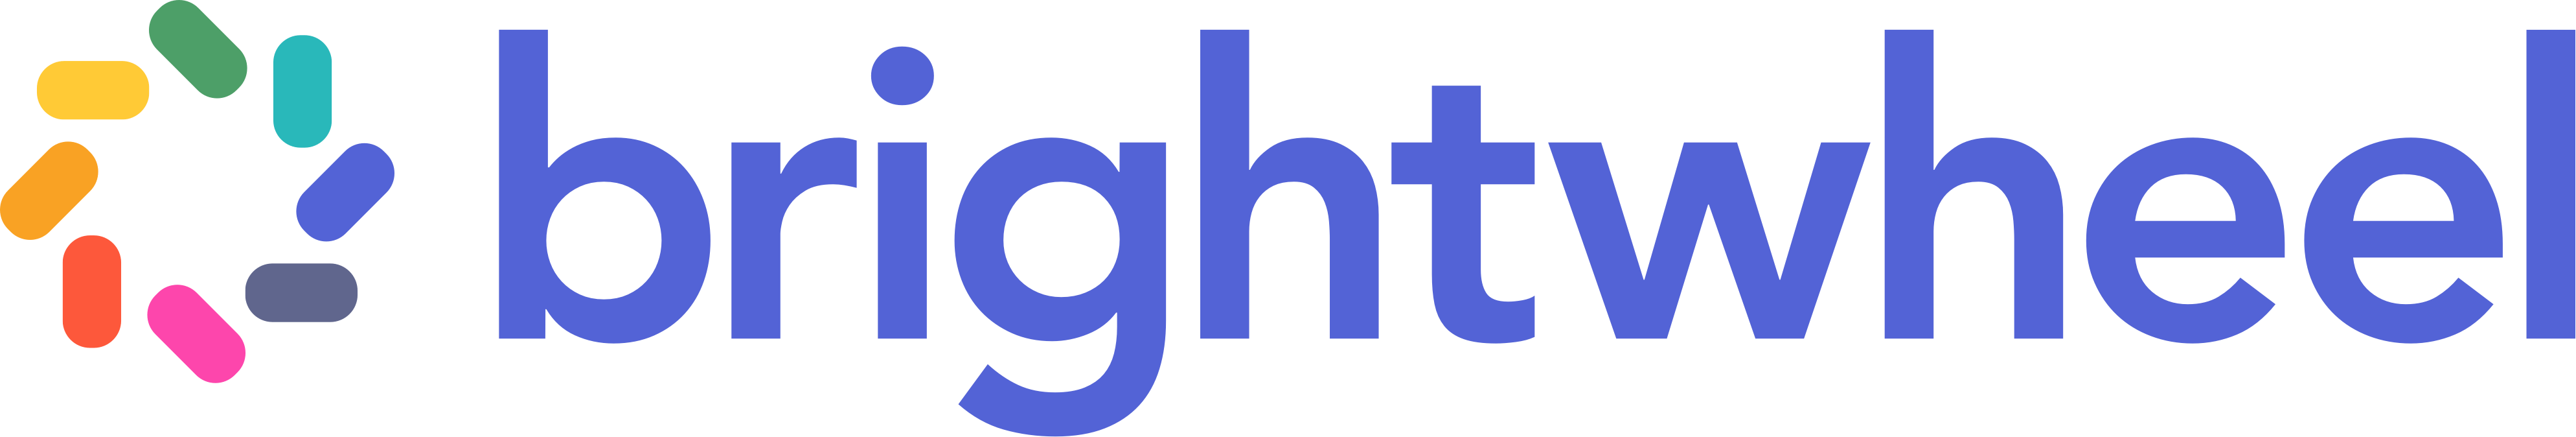 brightwheel-logo-name-icon-.5x.png